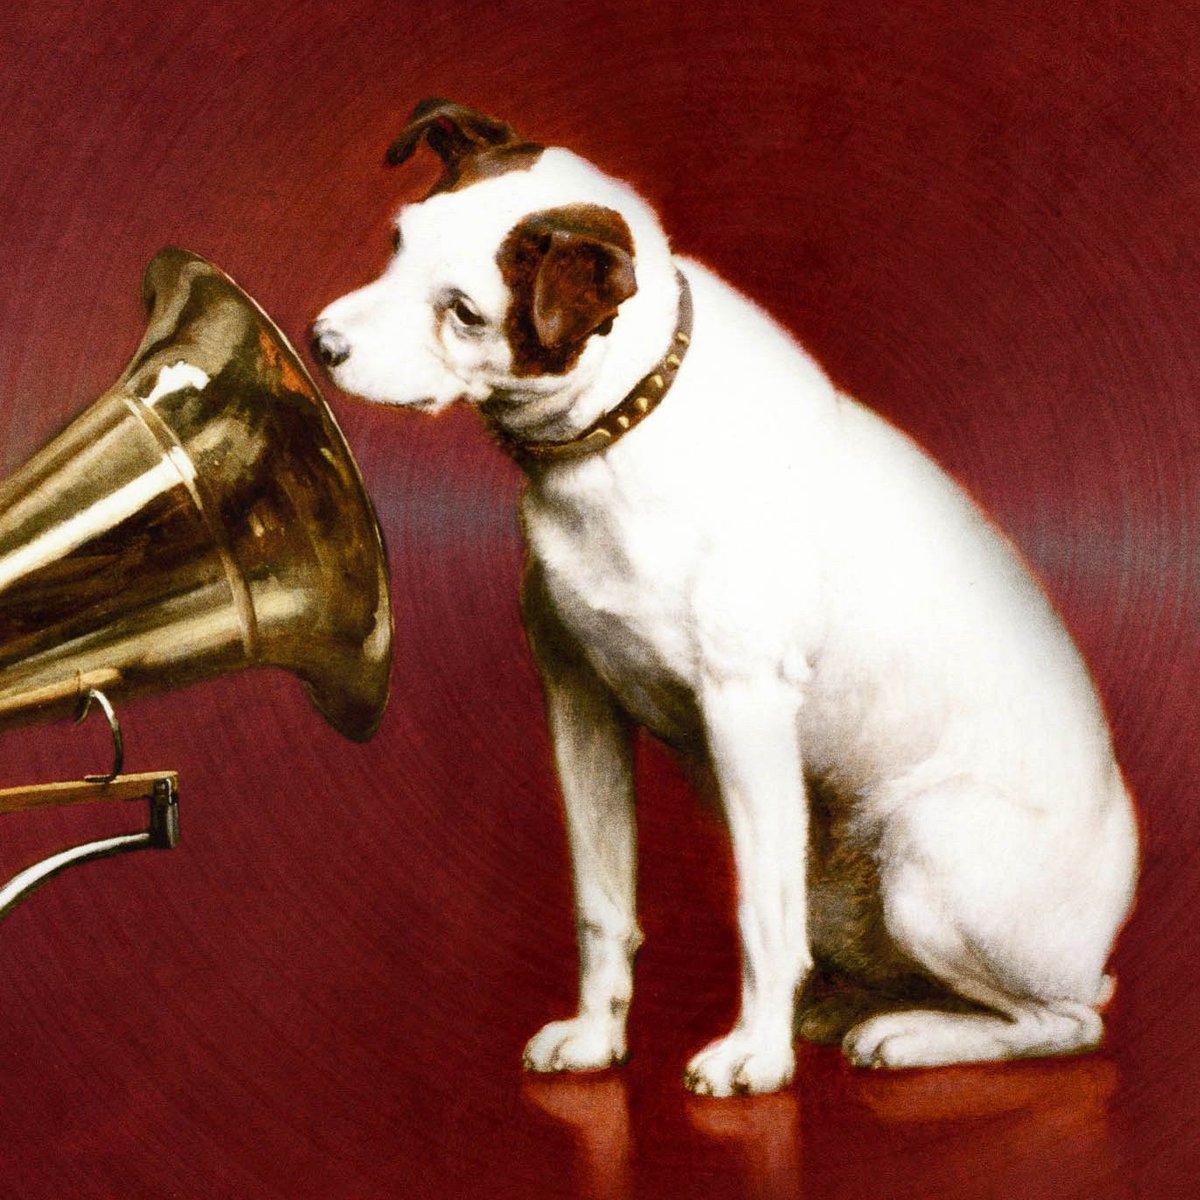 Dog Trumpet On Twitter Londonhistoryday 1921 The Gramophone